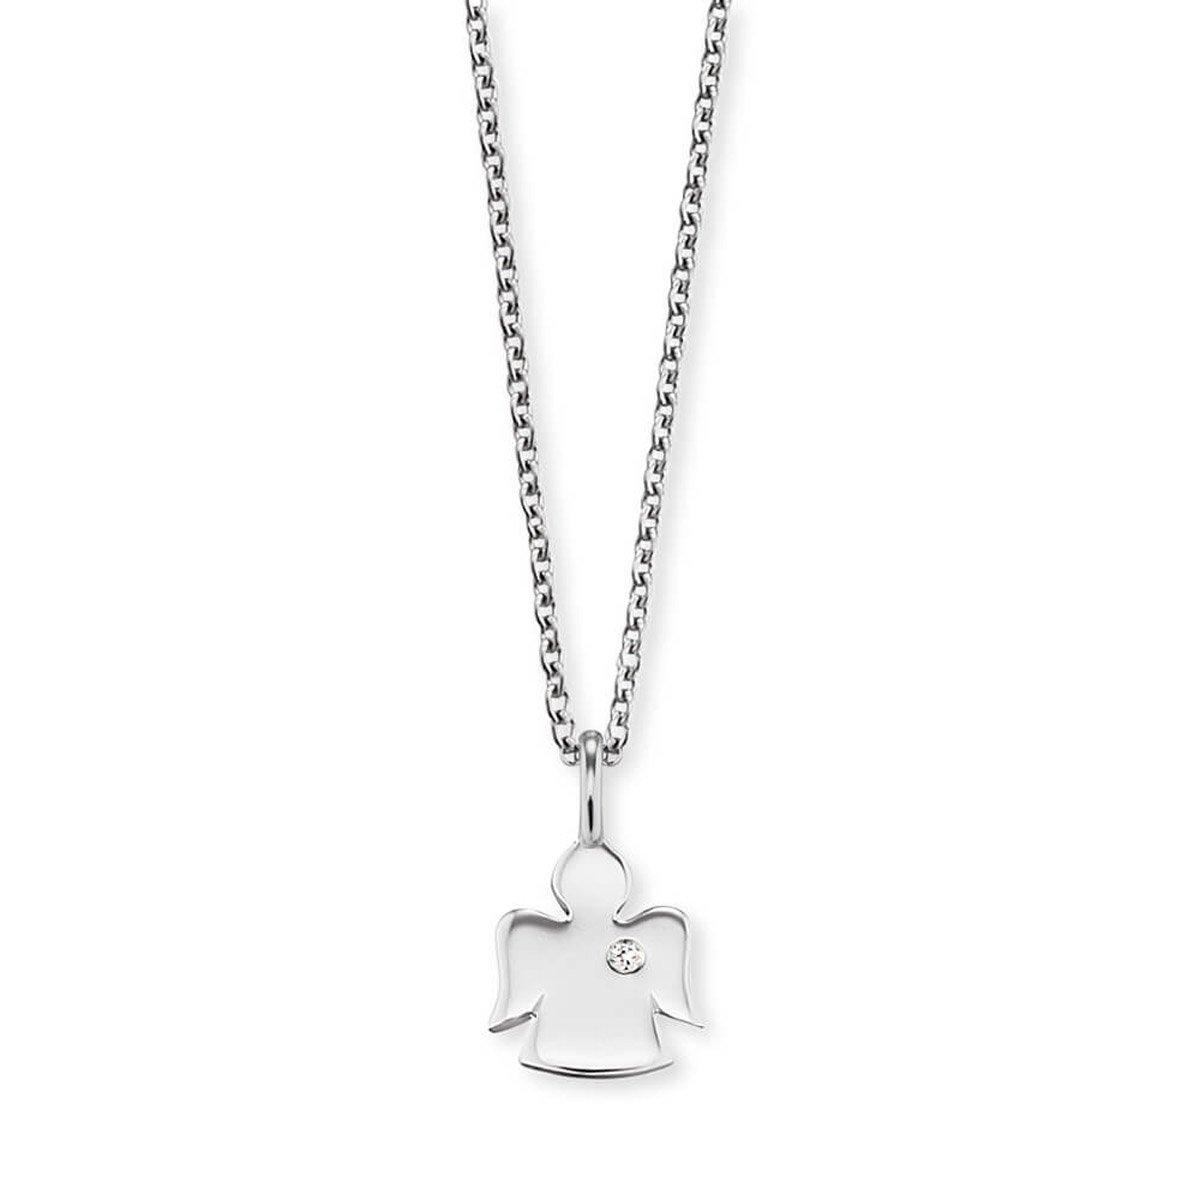 bei Uhrcenter: Herzengel HEN-ANGEL-ZI Kinder-Halskette Engel - Schmuck